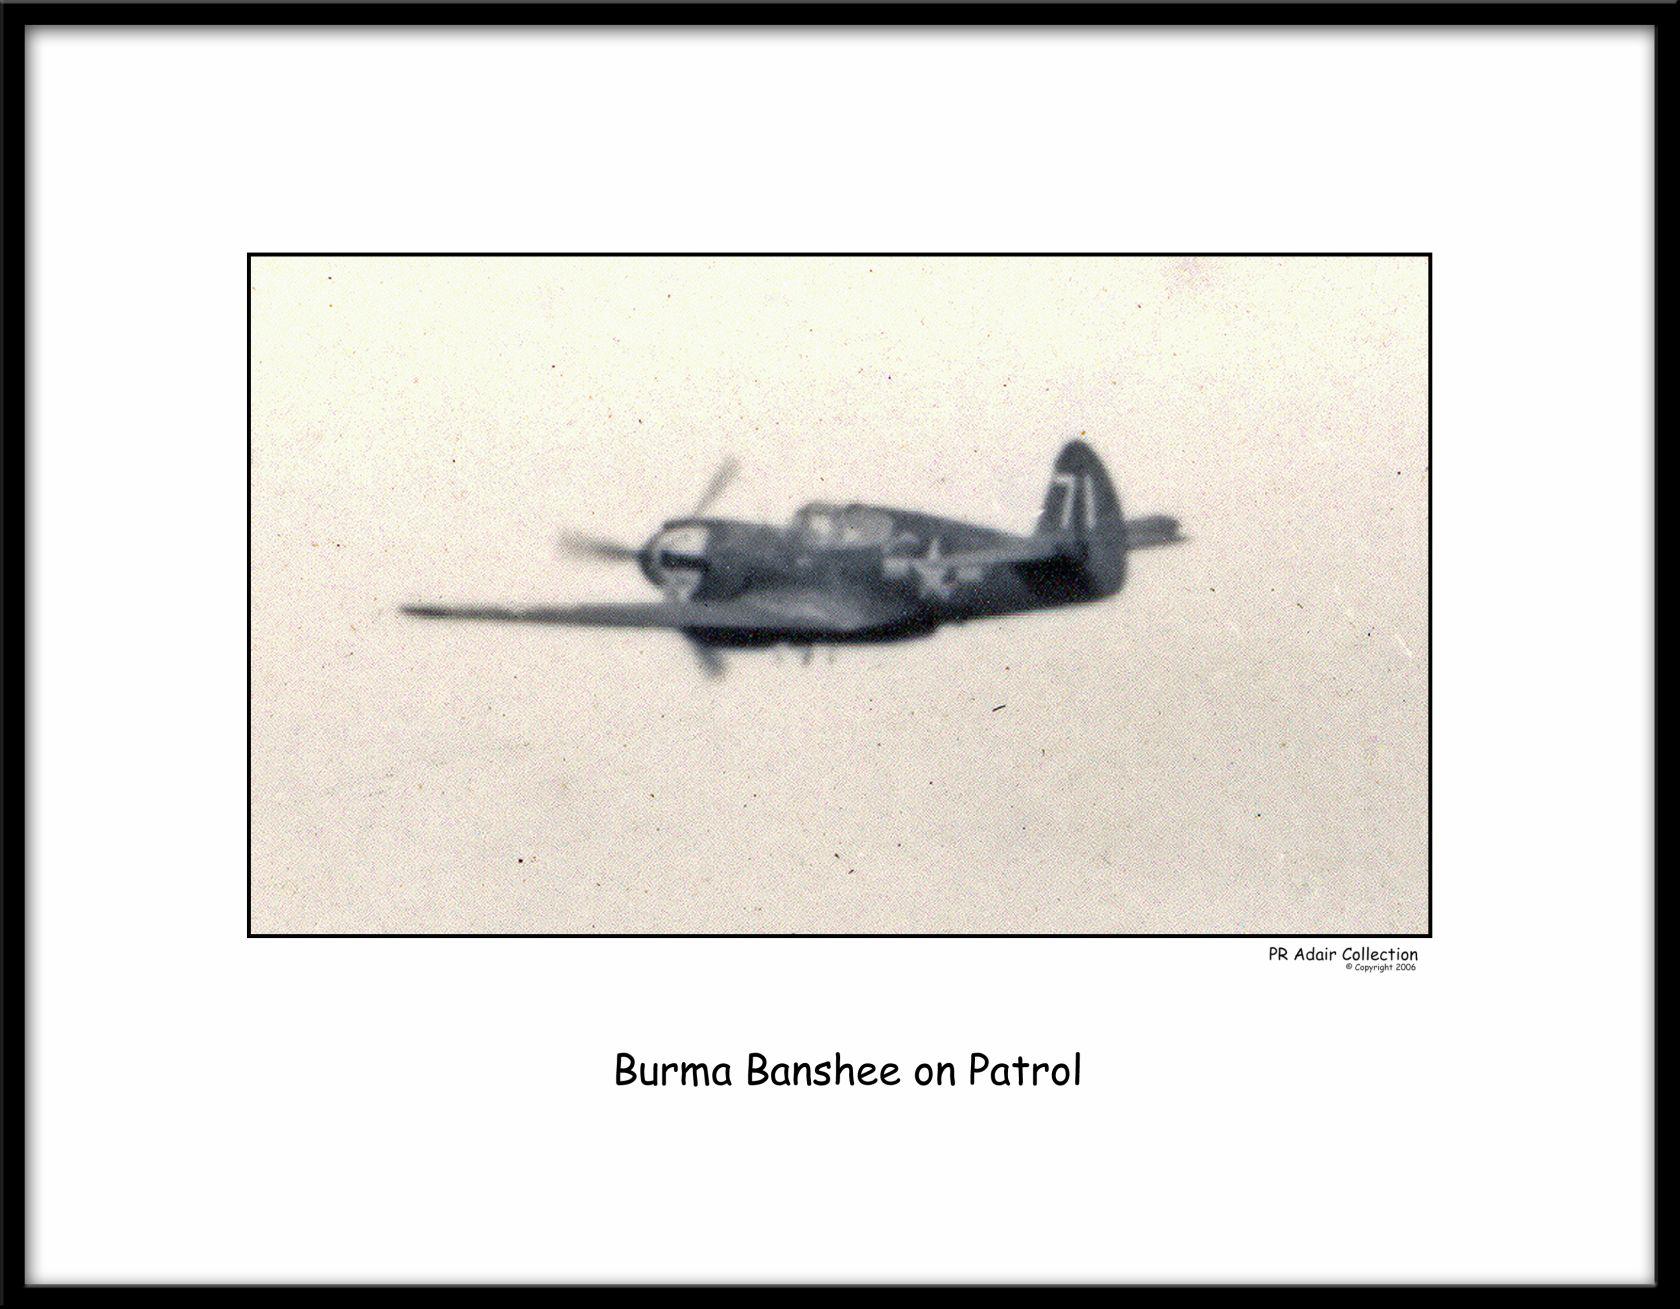 Burma Banshee 148